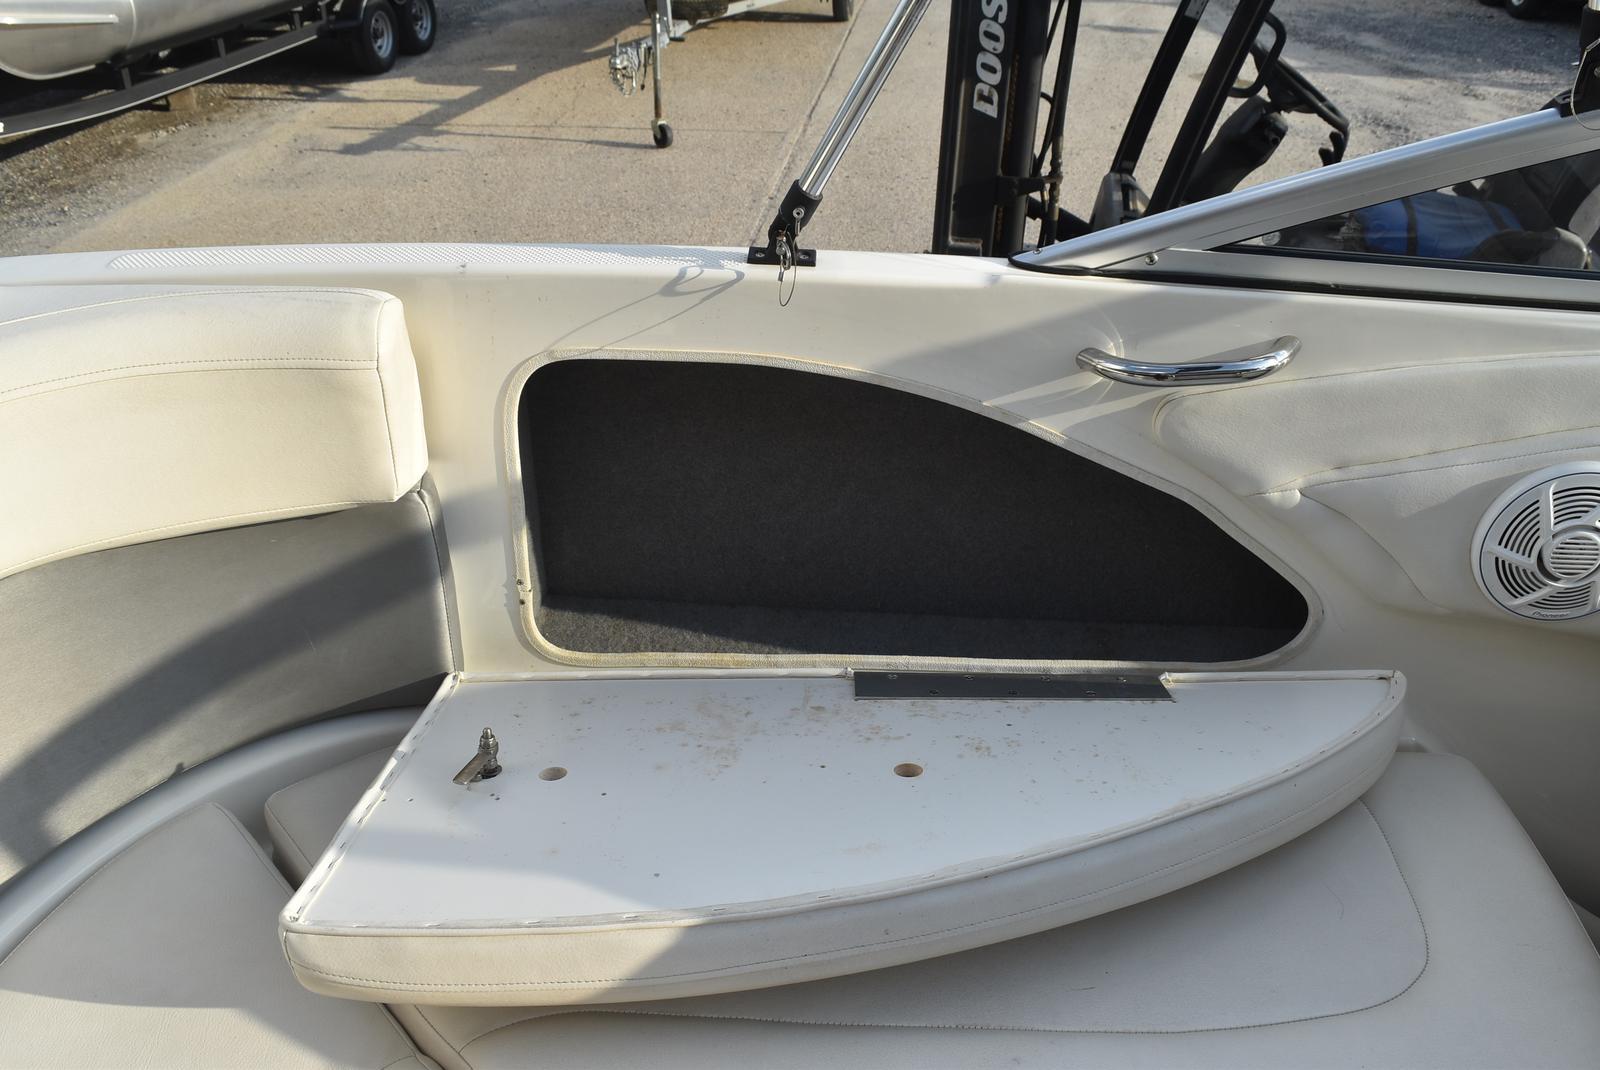 2010 Bayliner boat for sale, model of the boat is 235BR & Image # 13 of 43